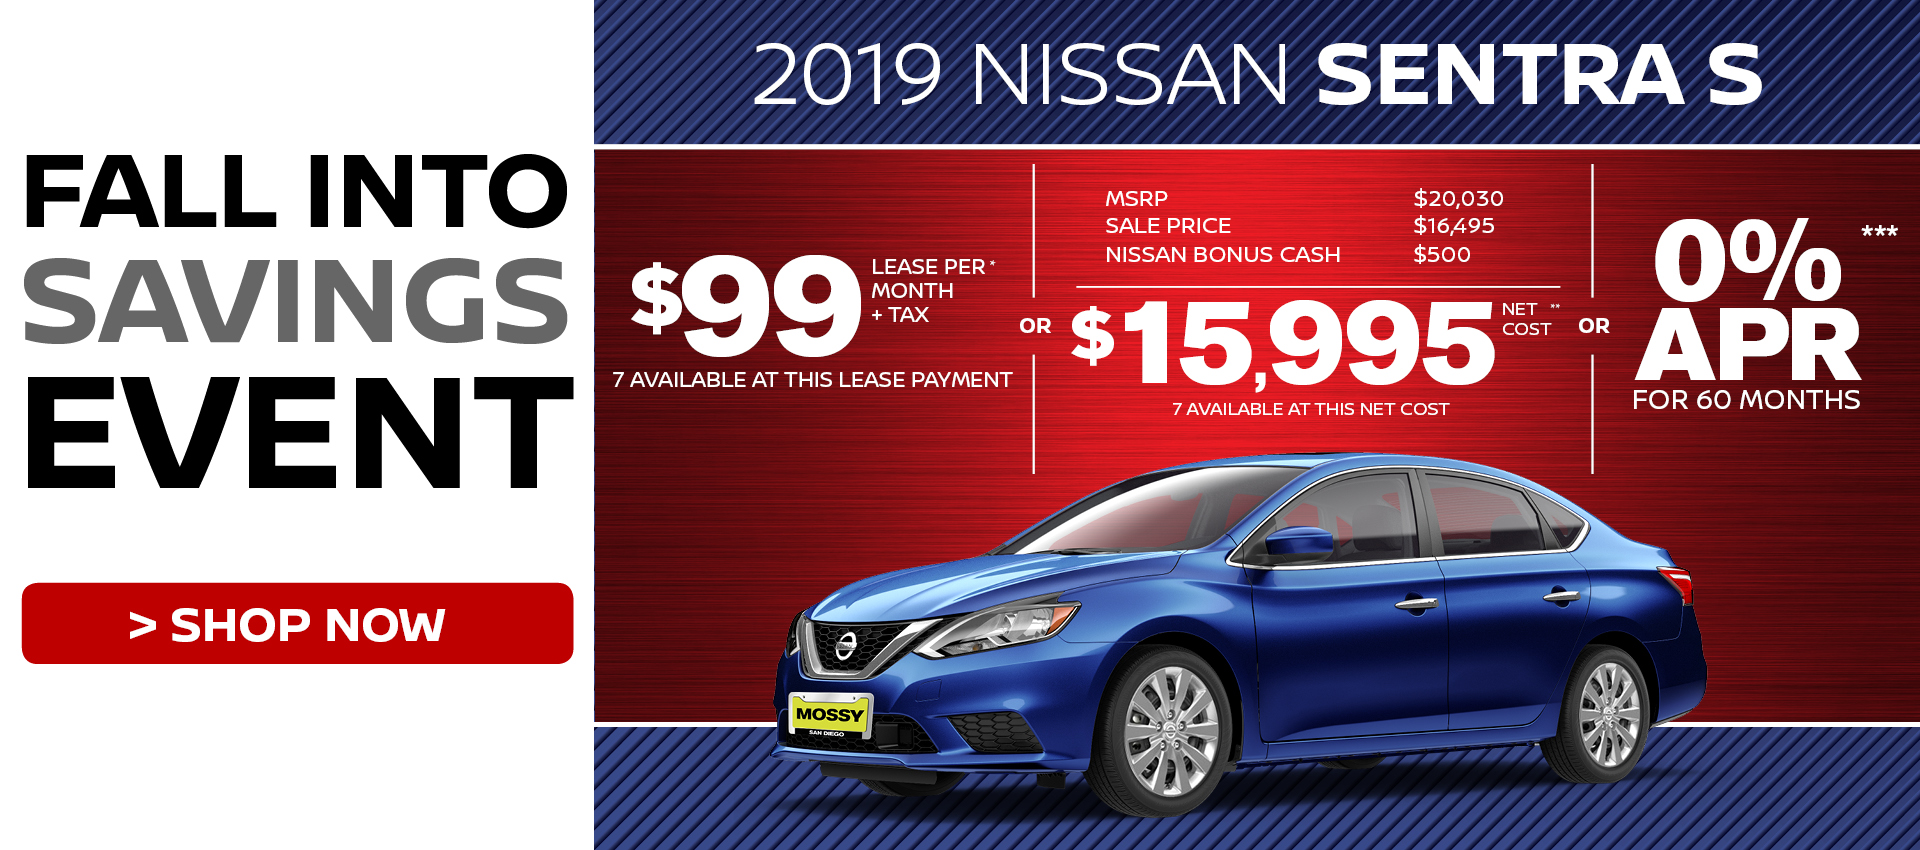 New & Used Nissan Dealer Serving San Diego, Carlsbad, Vista